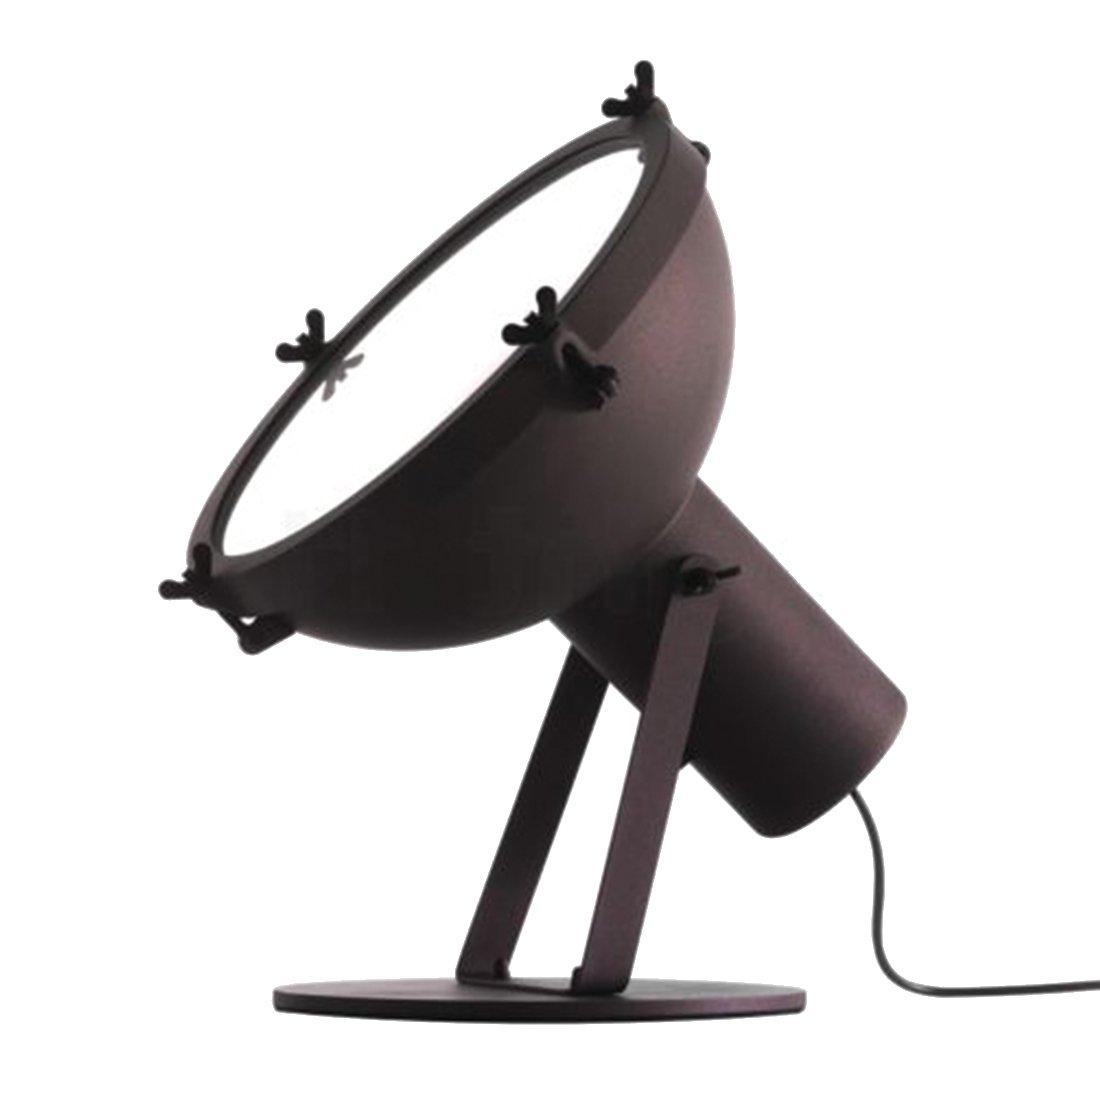 NEMO Projecteur 365 Vloerlamp Tafellamp Moka